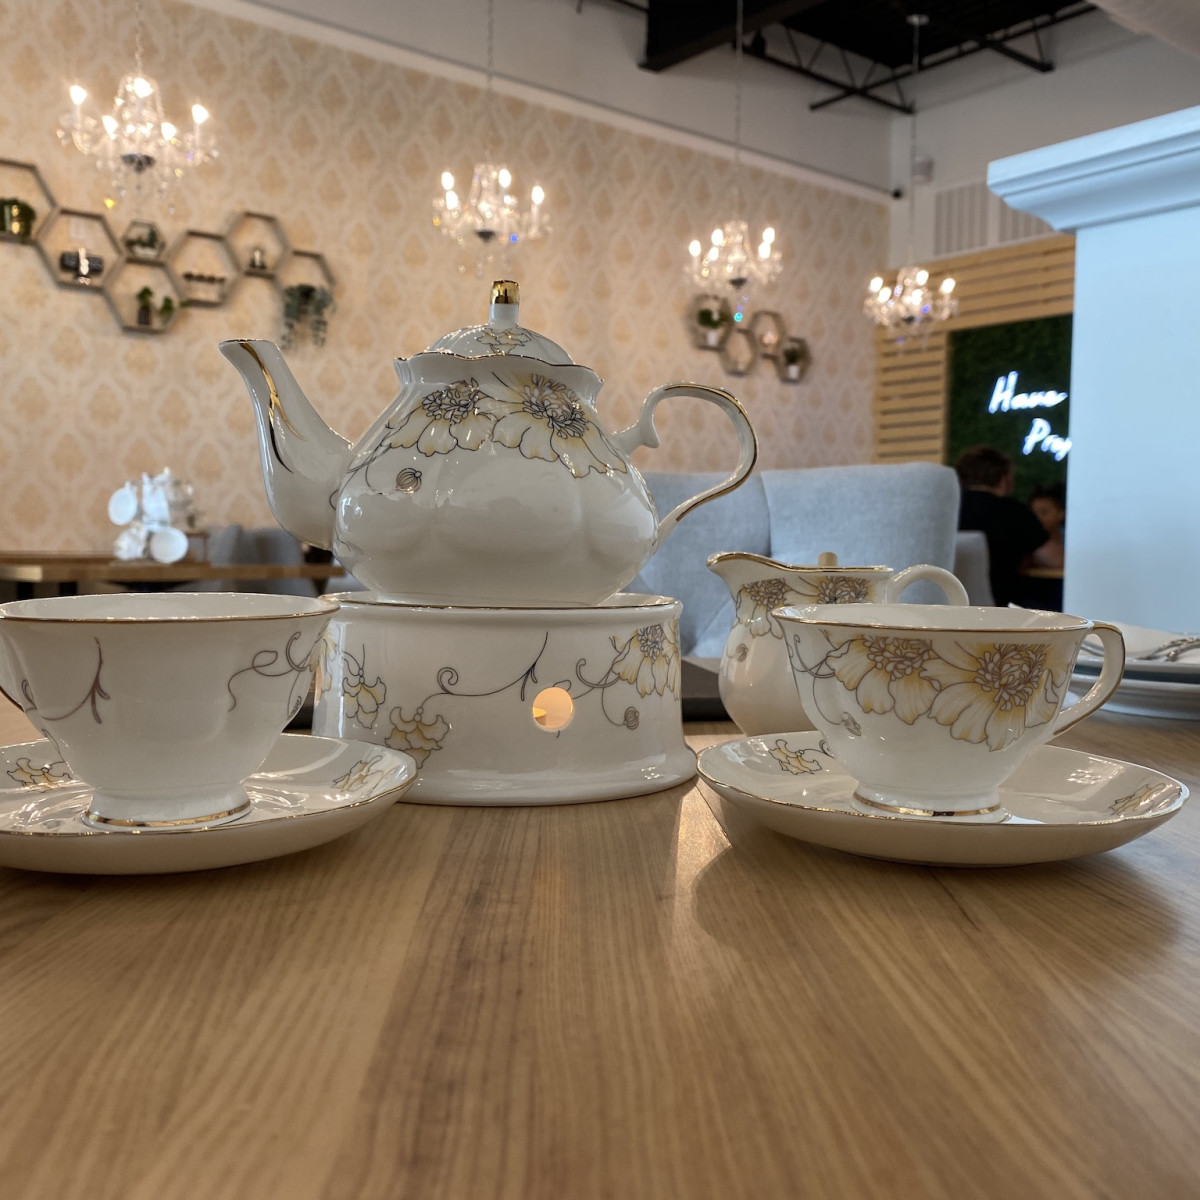 Proper Rose Garden tea set